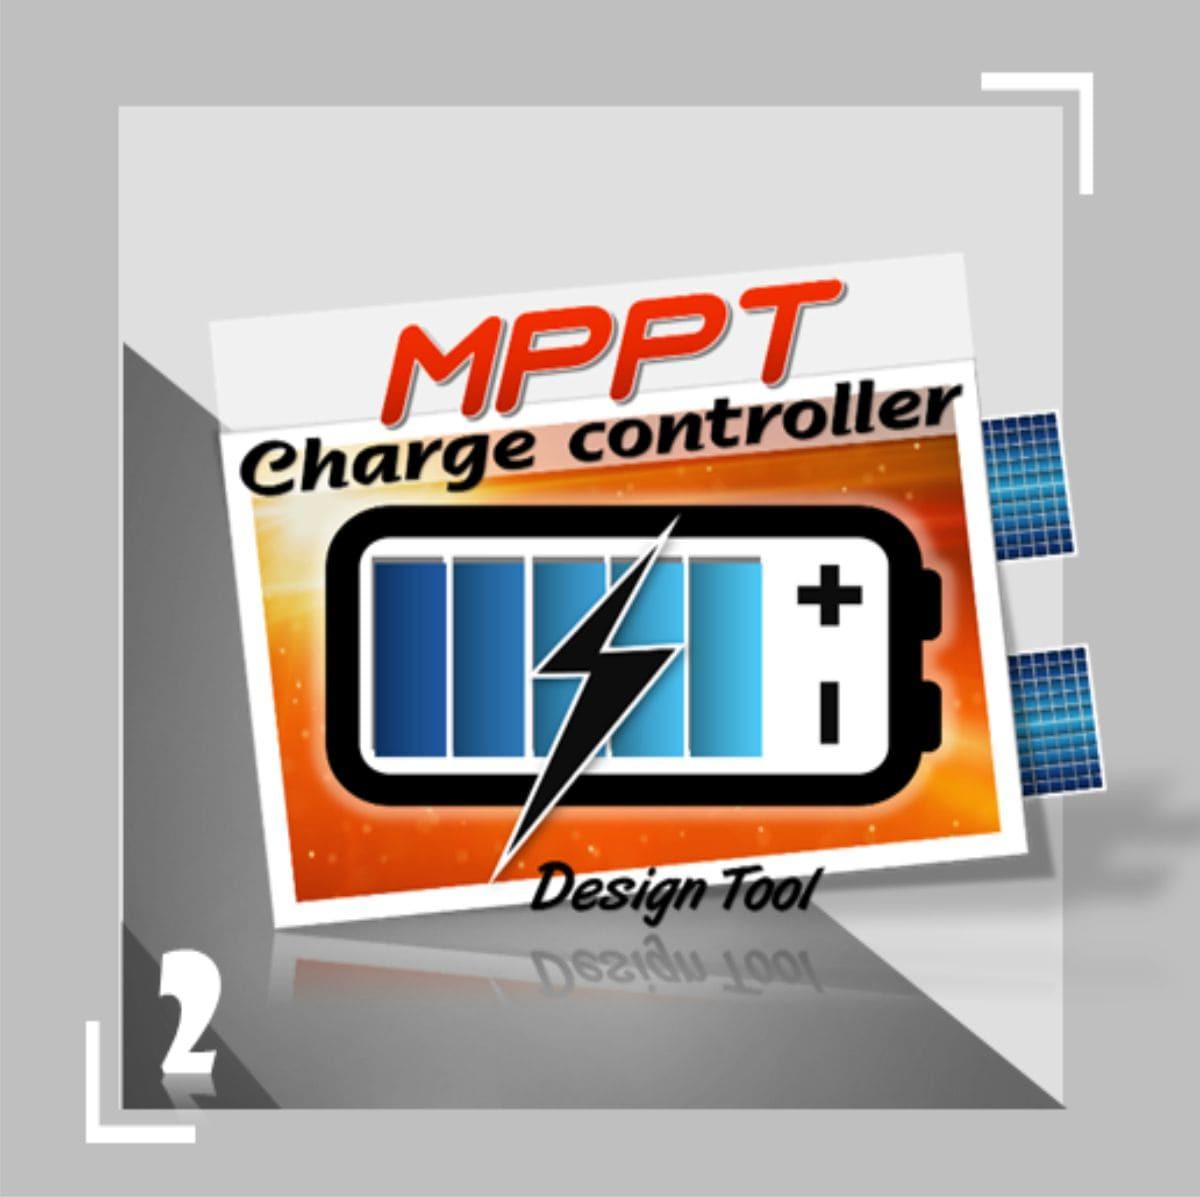 SM MPPT Charge Controller designer tool